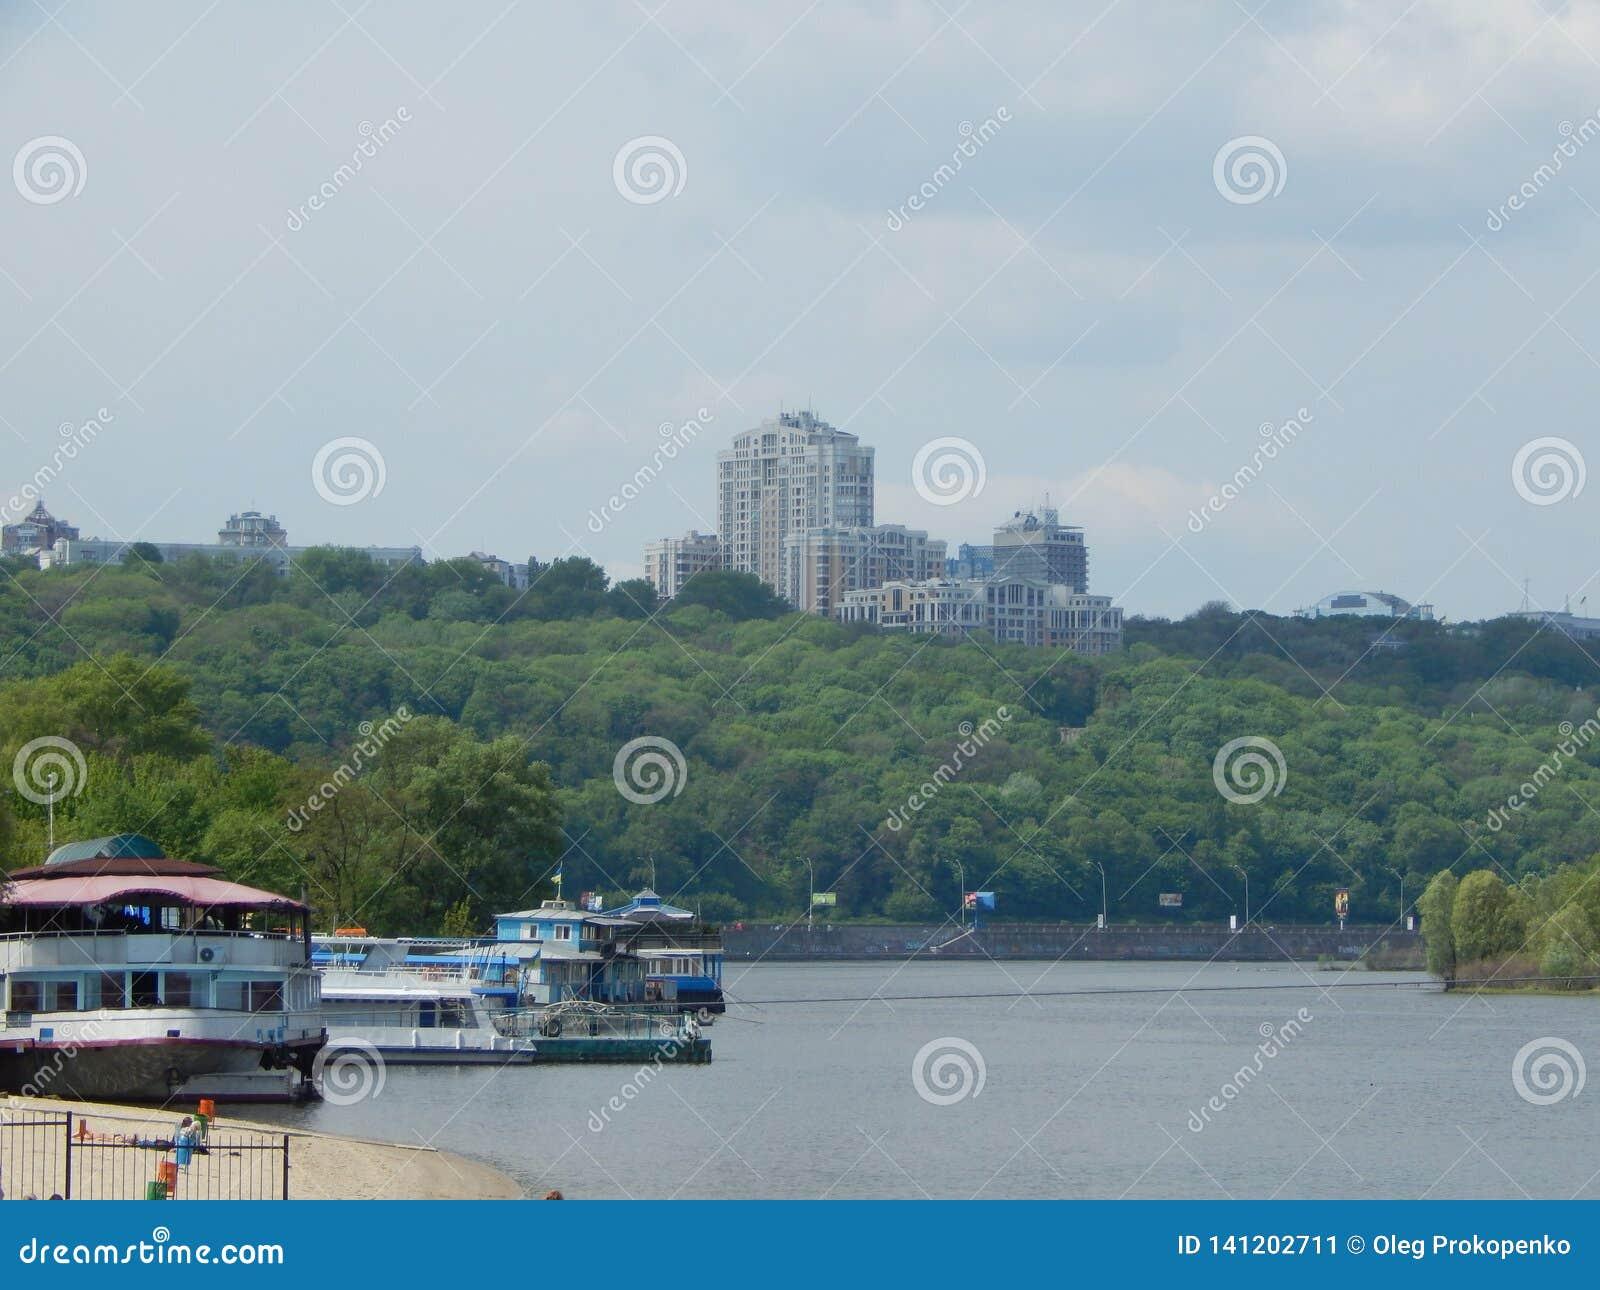 PARK KIEV IN MINIATURE, KIEV, UKRAINE